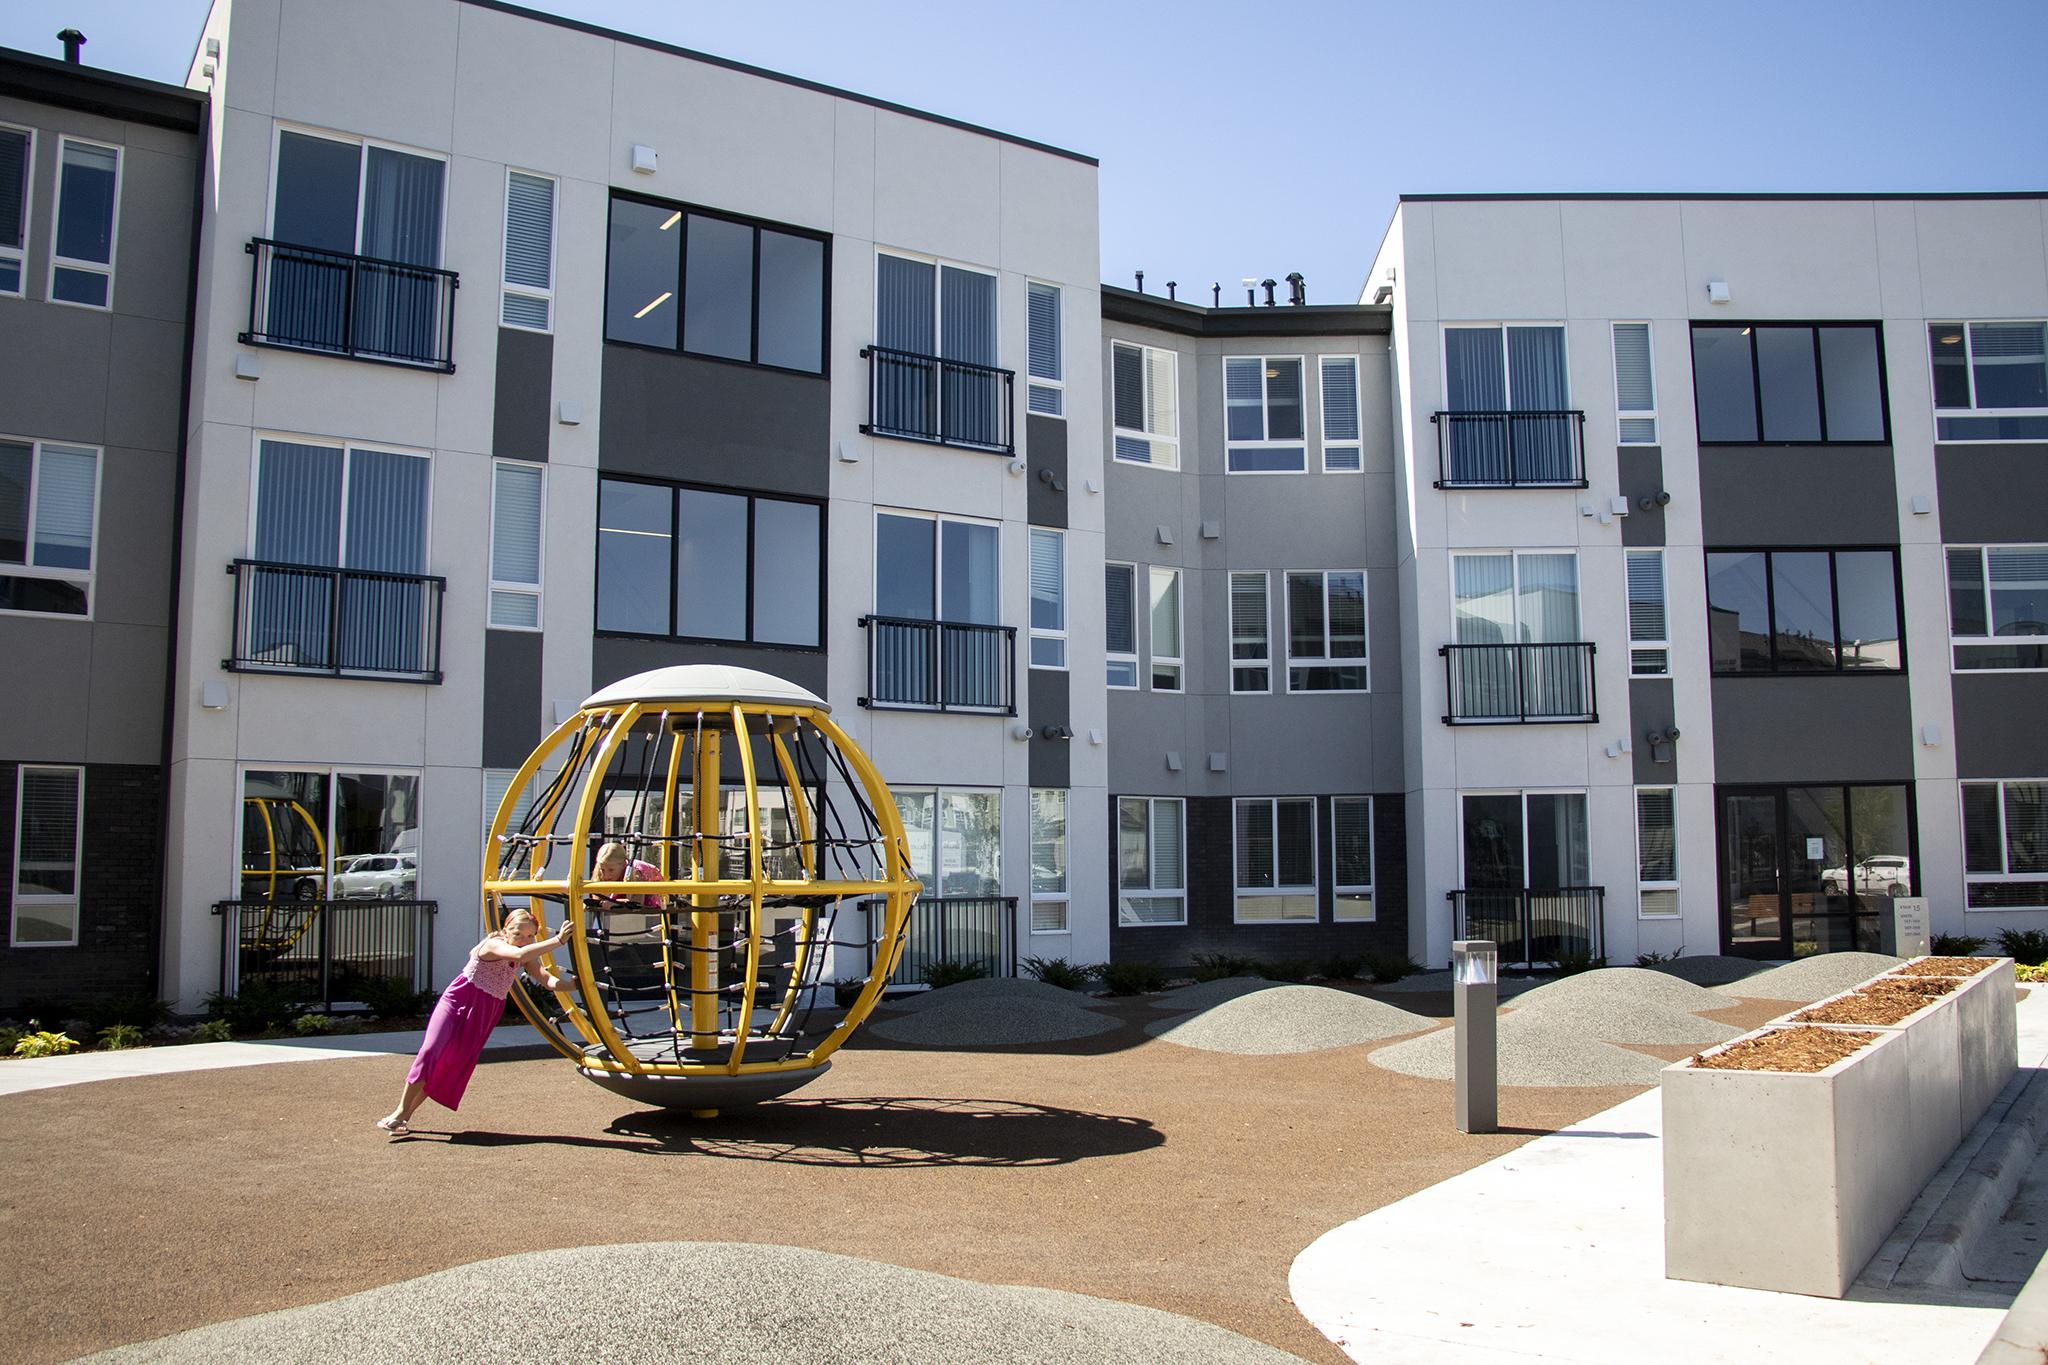 Moline Development Provides 180 Below Market Rate Apartments In Stapleton Denverite The Denver Site